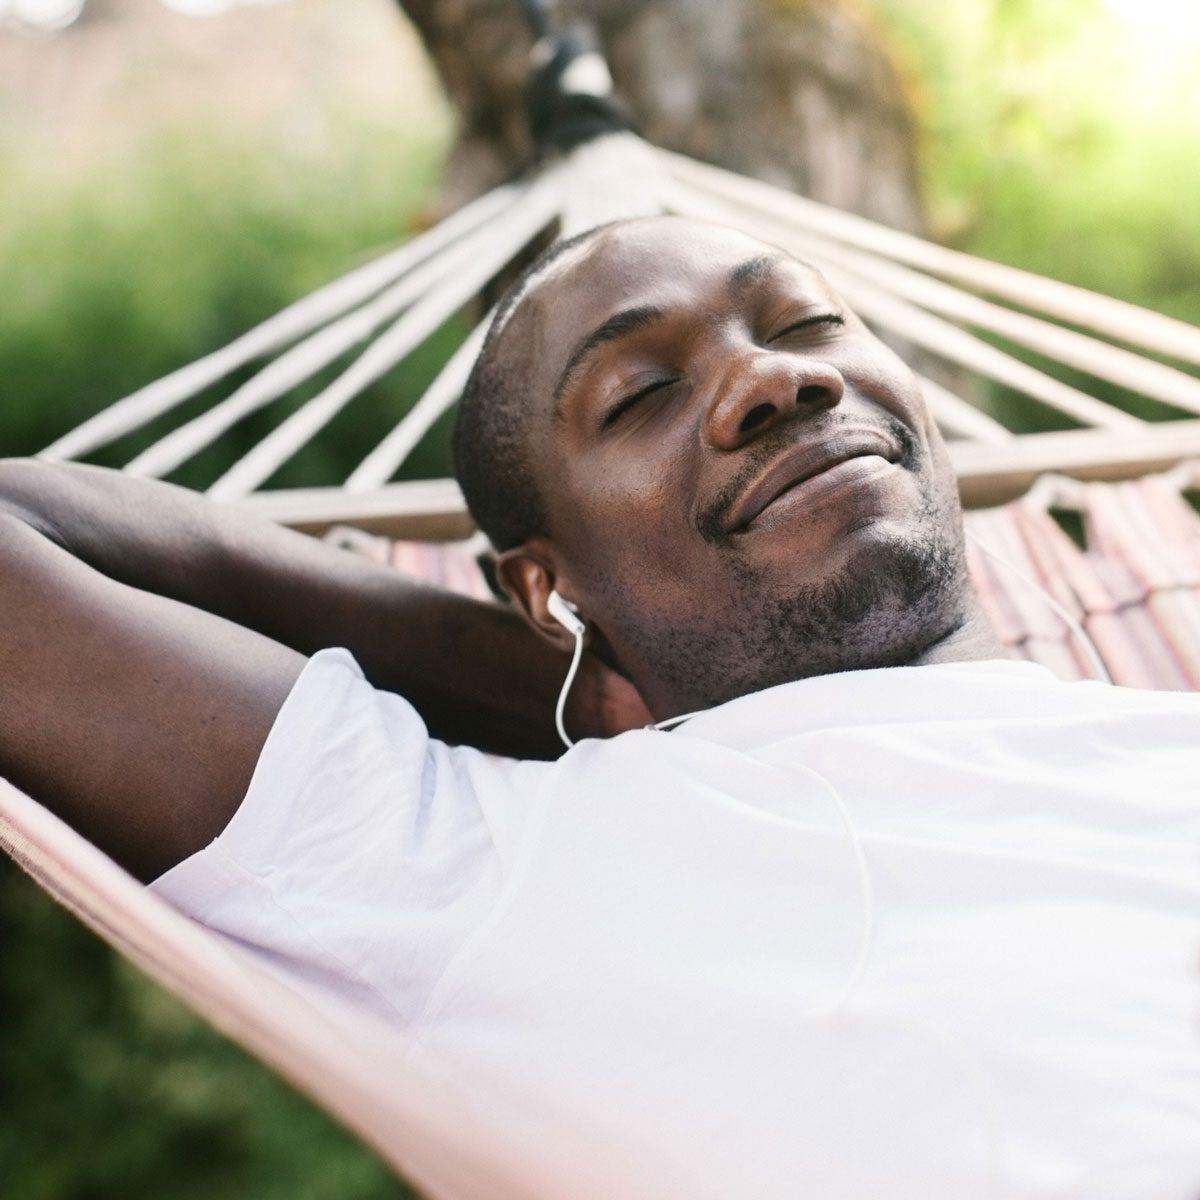 Patio hammock